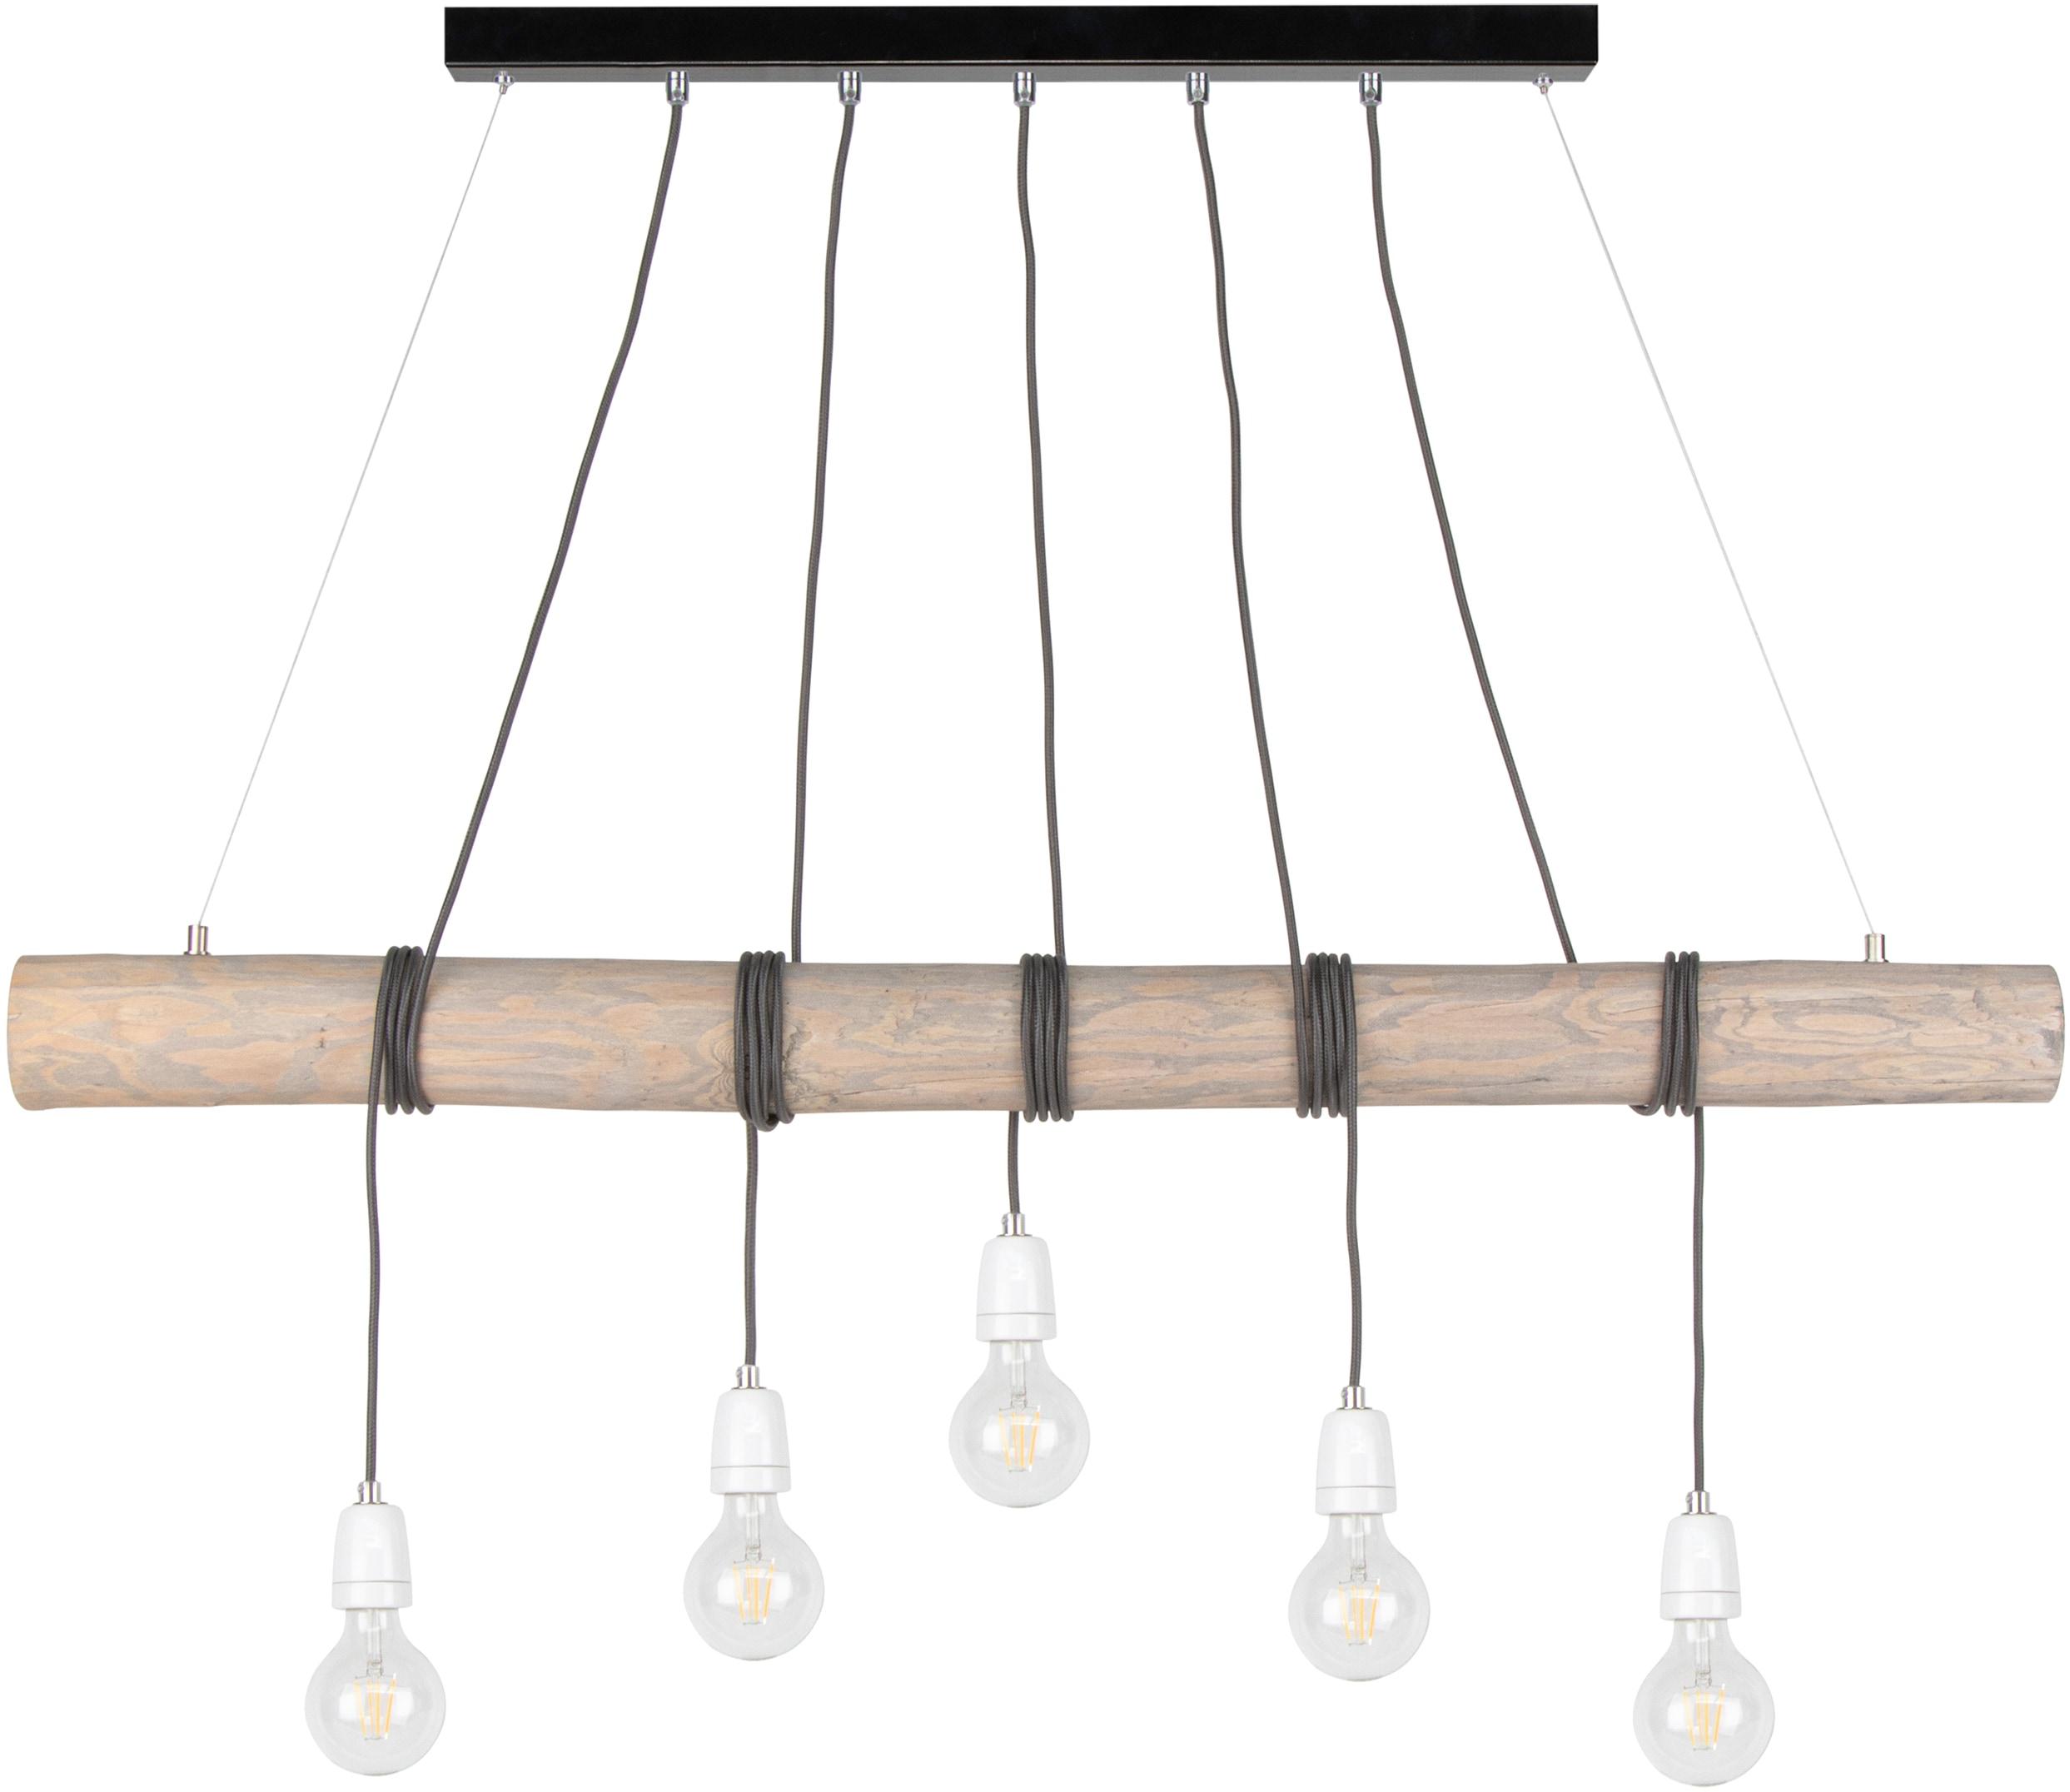 SPOT Light Pendelleuchte TRABO PORCIA, E27, Hängeleuchte, Holzbalken aus massivem Kiefernholz Ø 8-12 cm, Holz grau gebeizt, nachhaltig - FSC-zertifiziert, Made in Europe